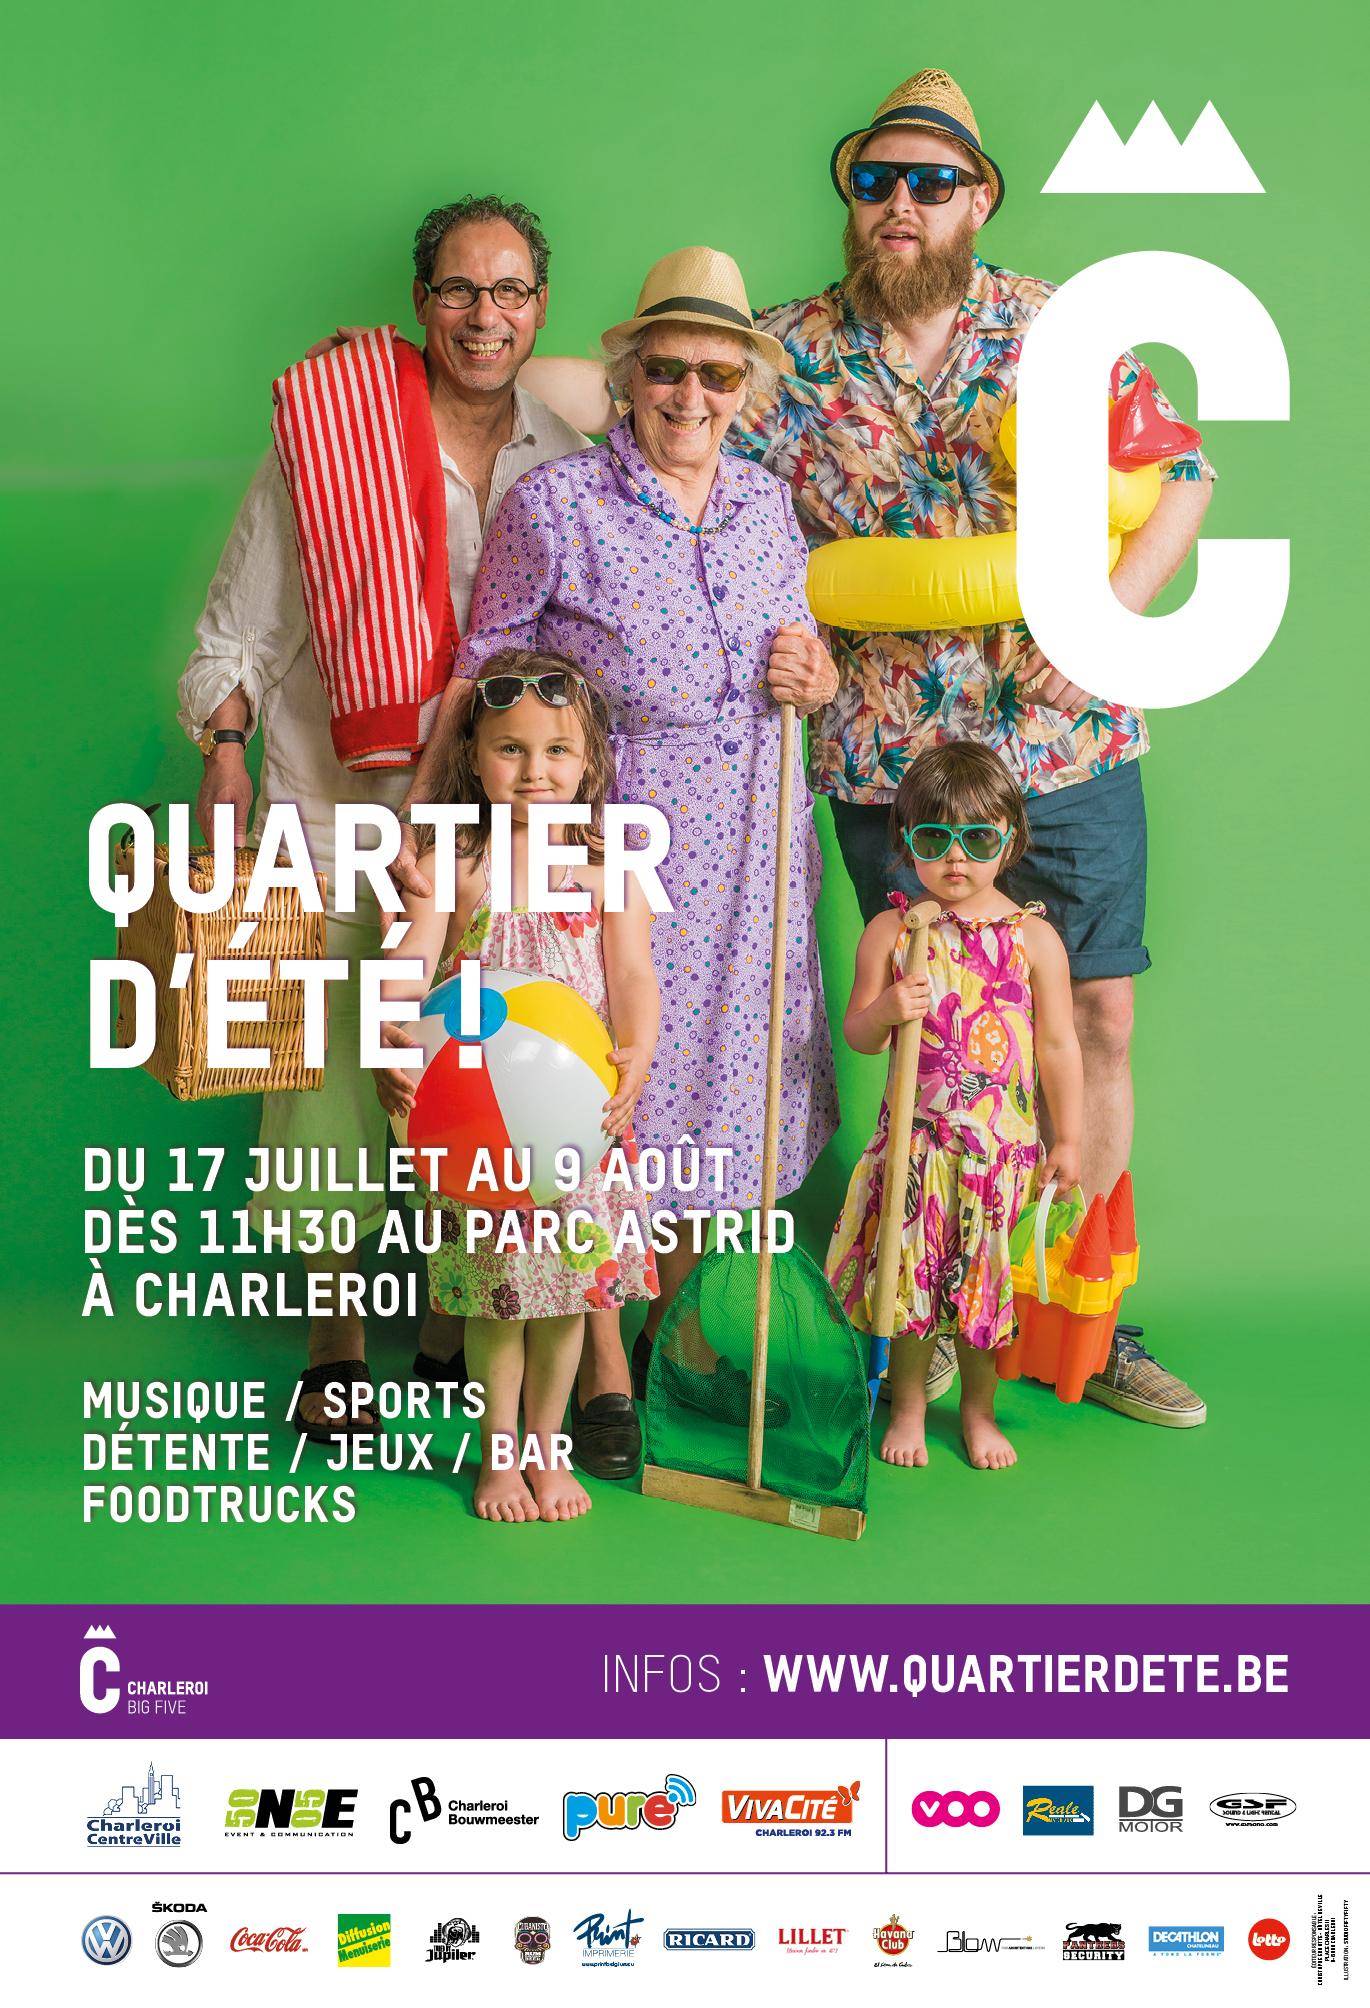 identite-charleroi-logo_BIG-FIVE_QUARTIER-ETE-2015